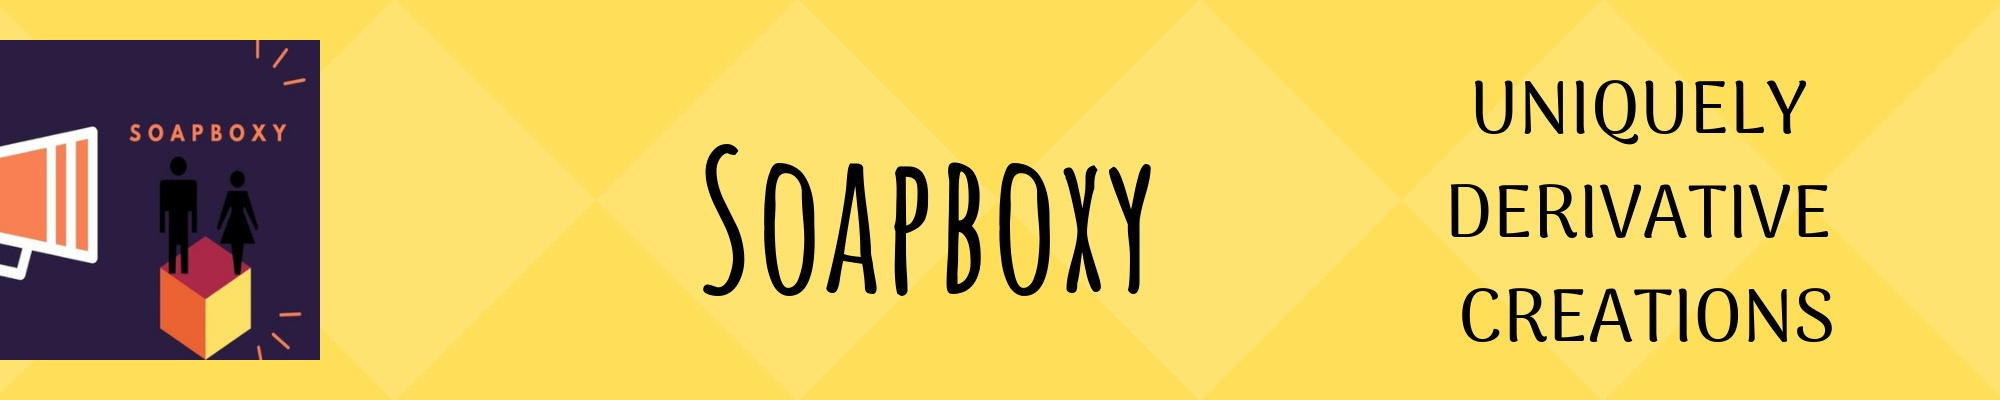 Soapboxy Cover